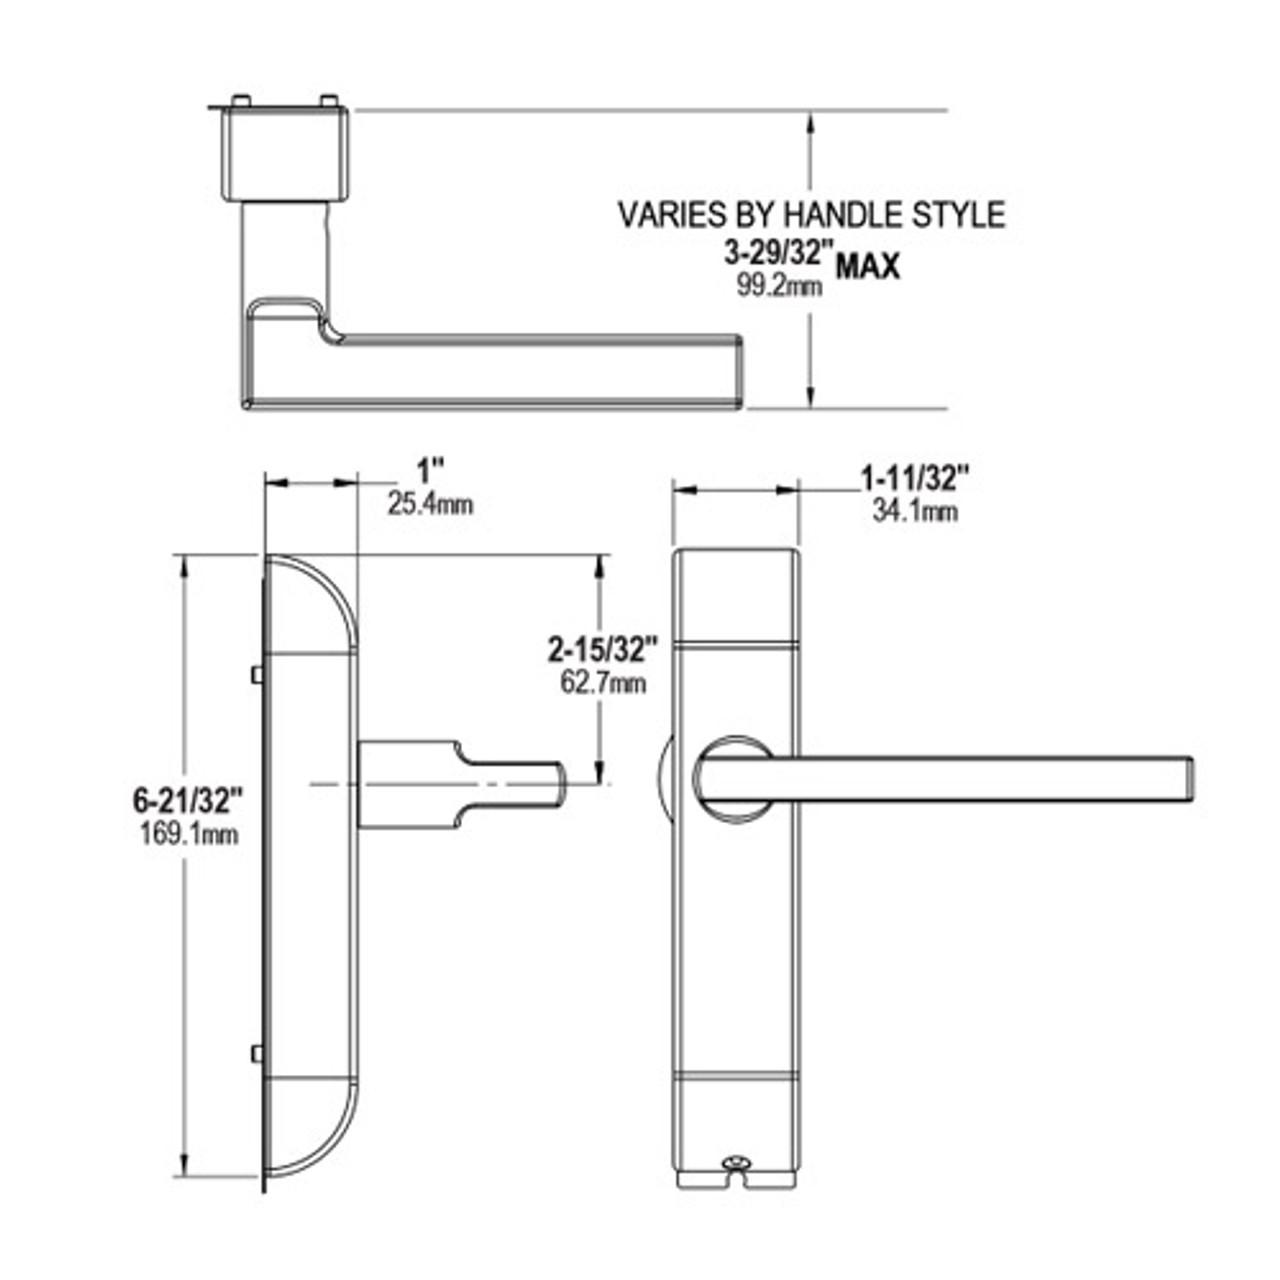 4600-MW-521-US32 Adams Rite MW Designer handle Dimensional View